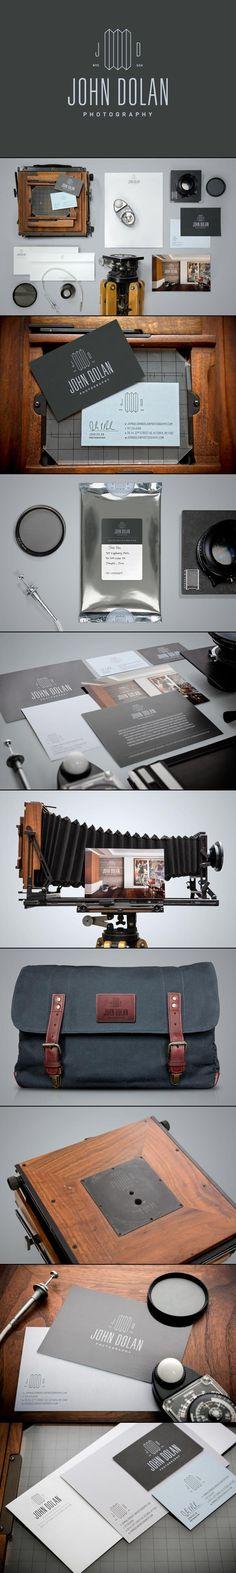 John Dolan Photography | #stationary #corporate #design #corporatedesign #identity #branding #marketing < repinned by www.BlickeDeeler.de